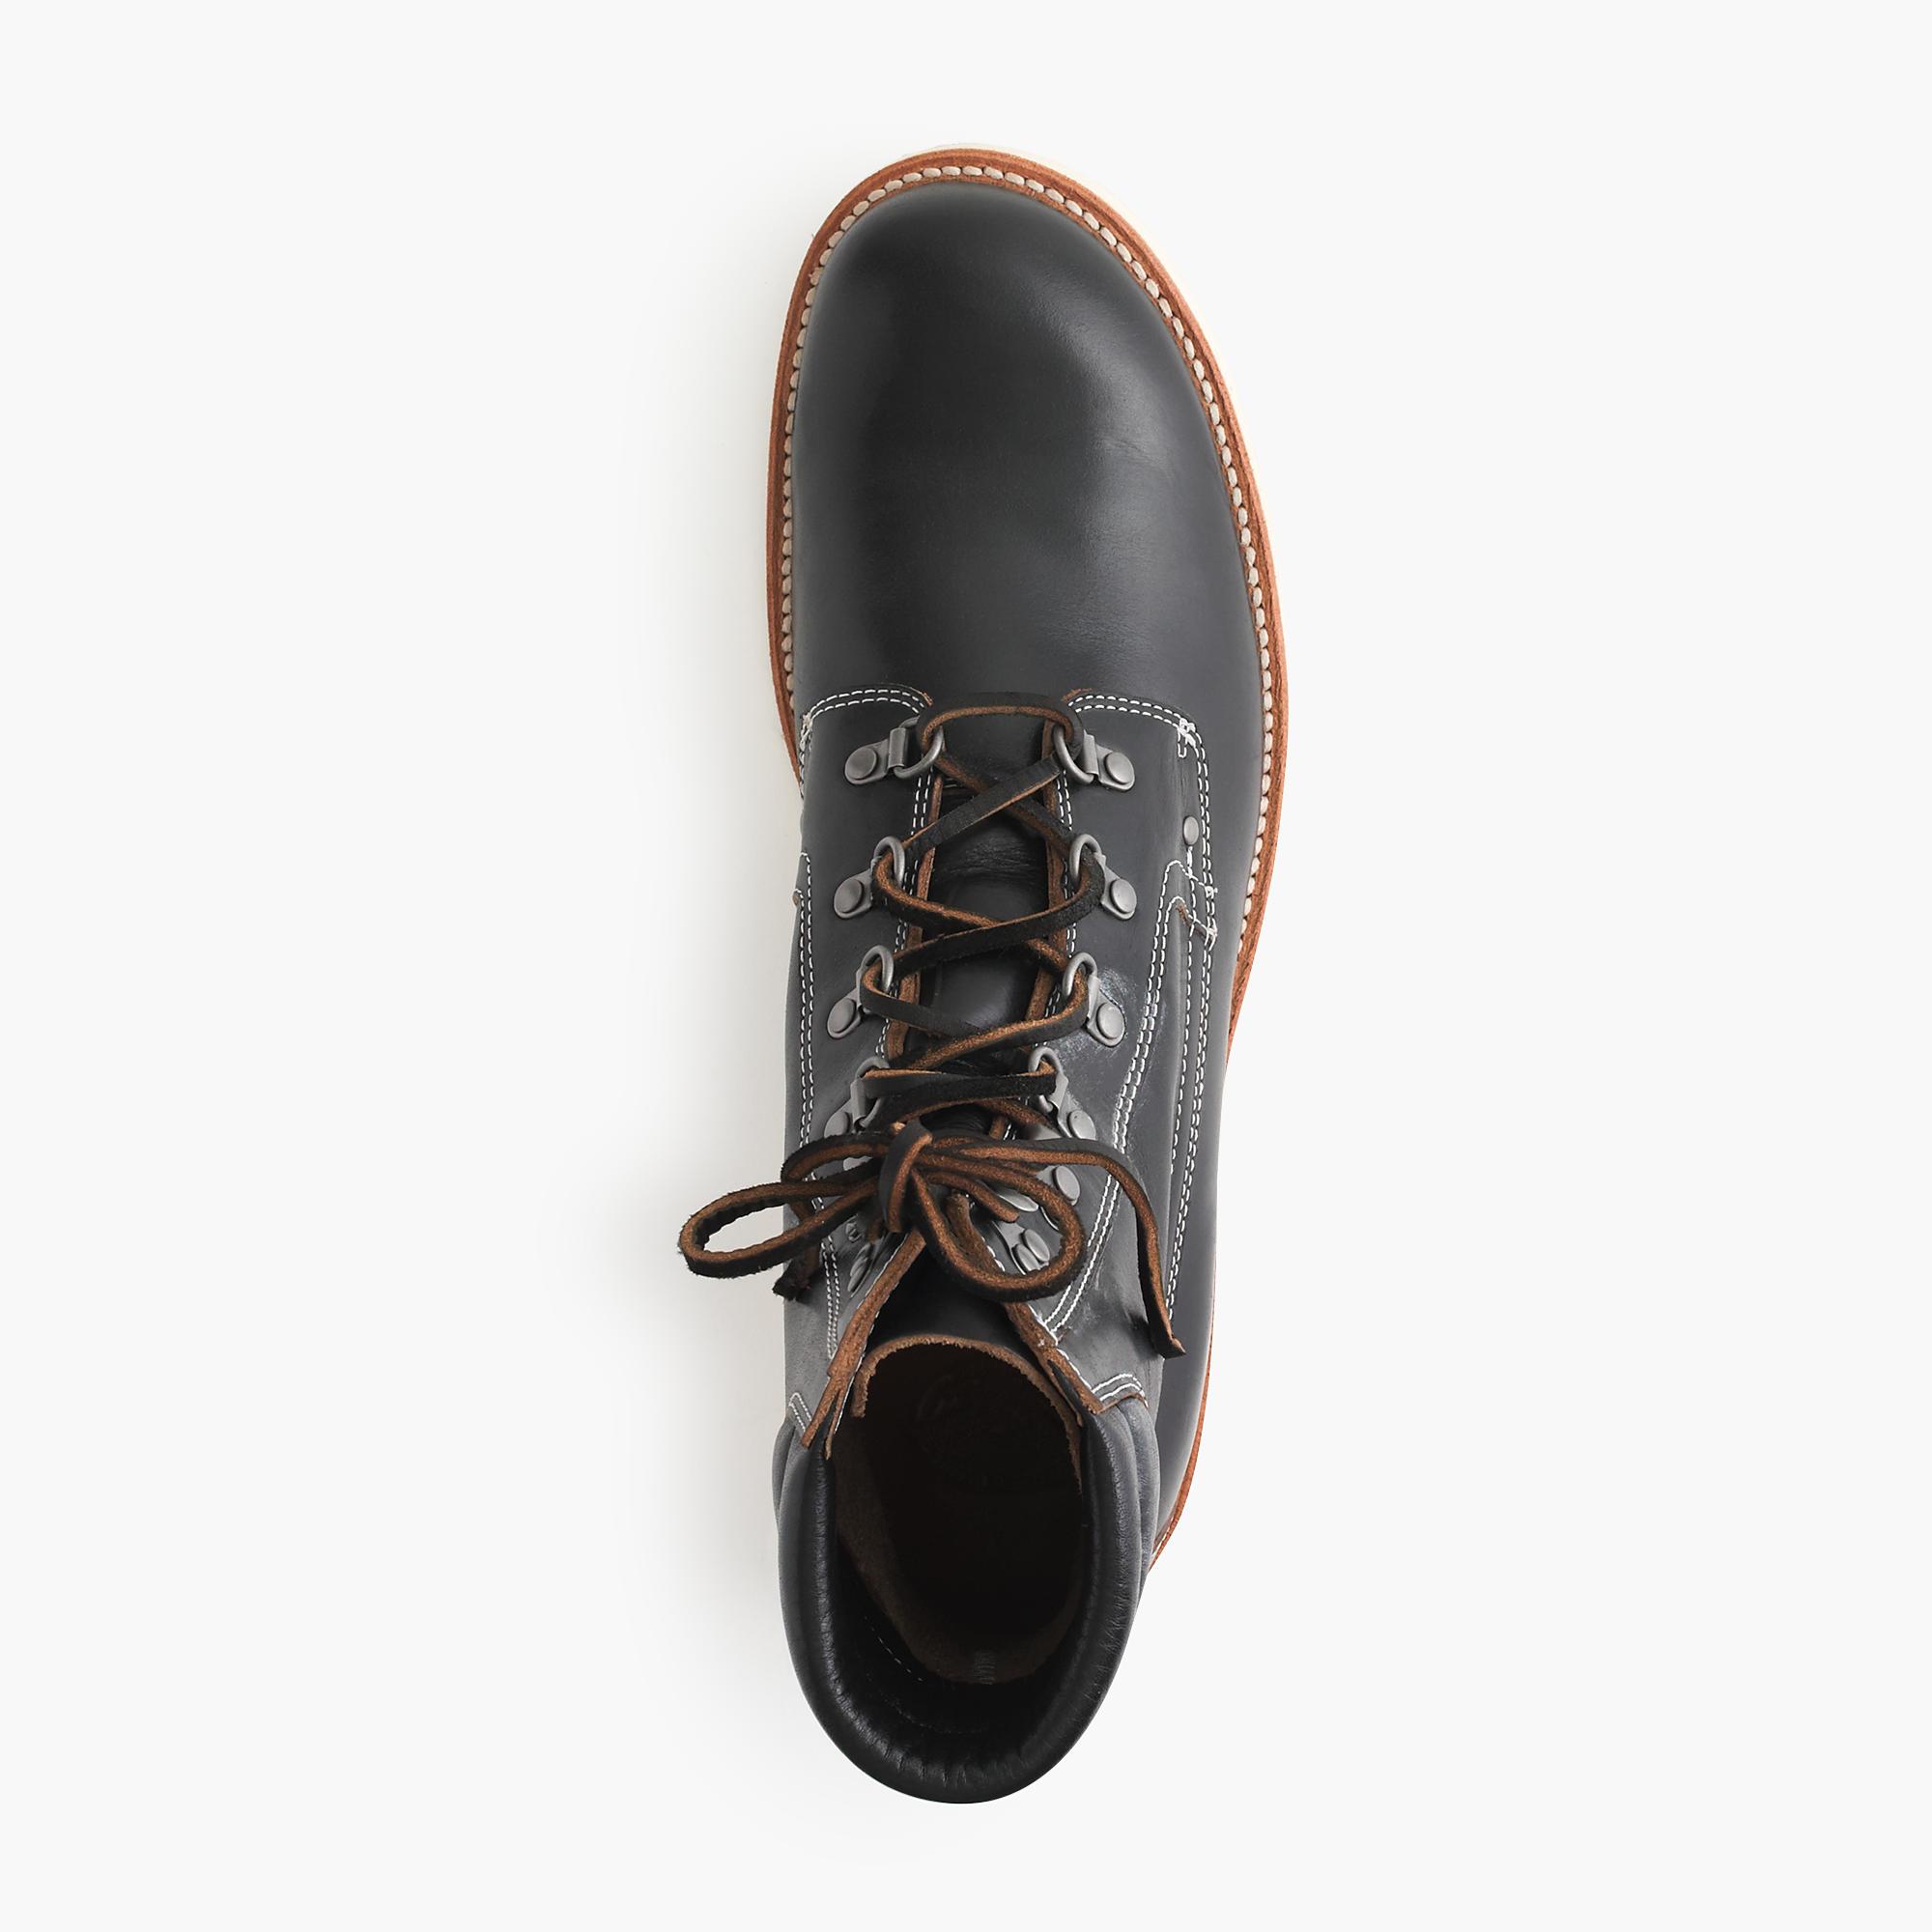 Lyst - J.Crew Wallace & Barnes Plain-toe Byrd Boots in ...